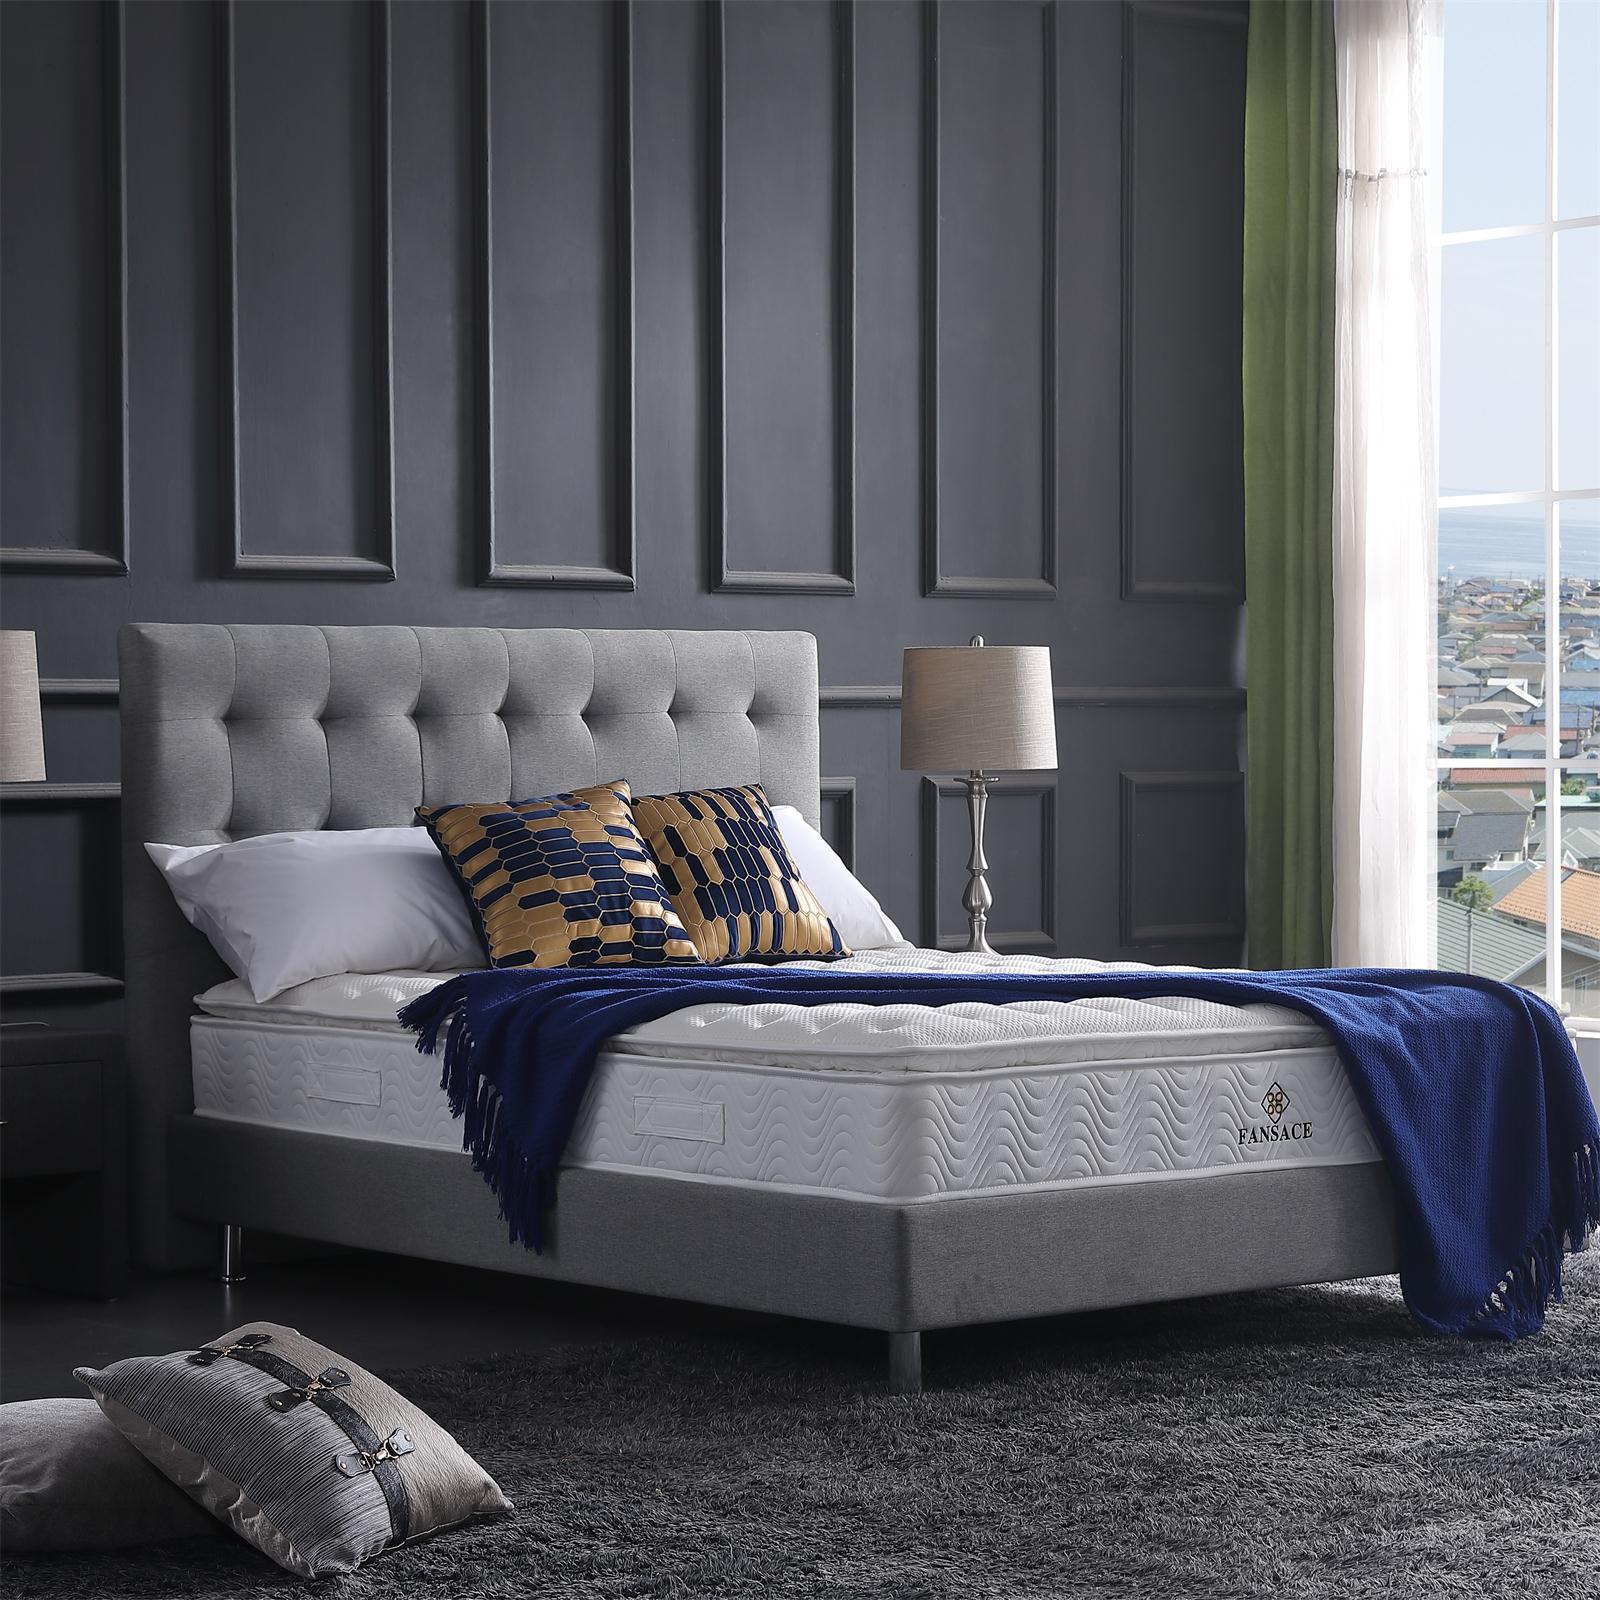 JLH foam orthopedic mattress marketing with elasticity-2